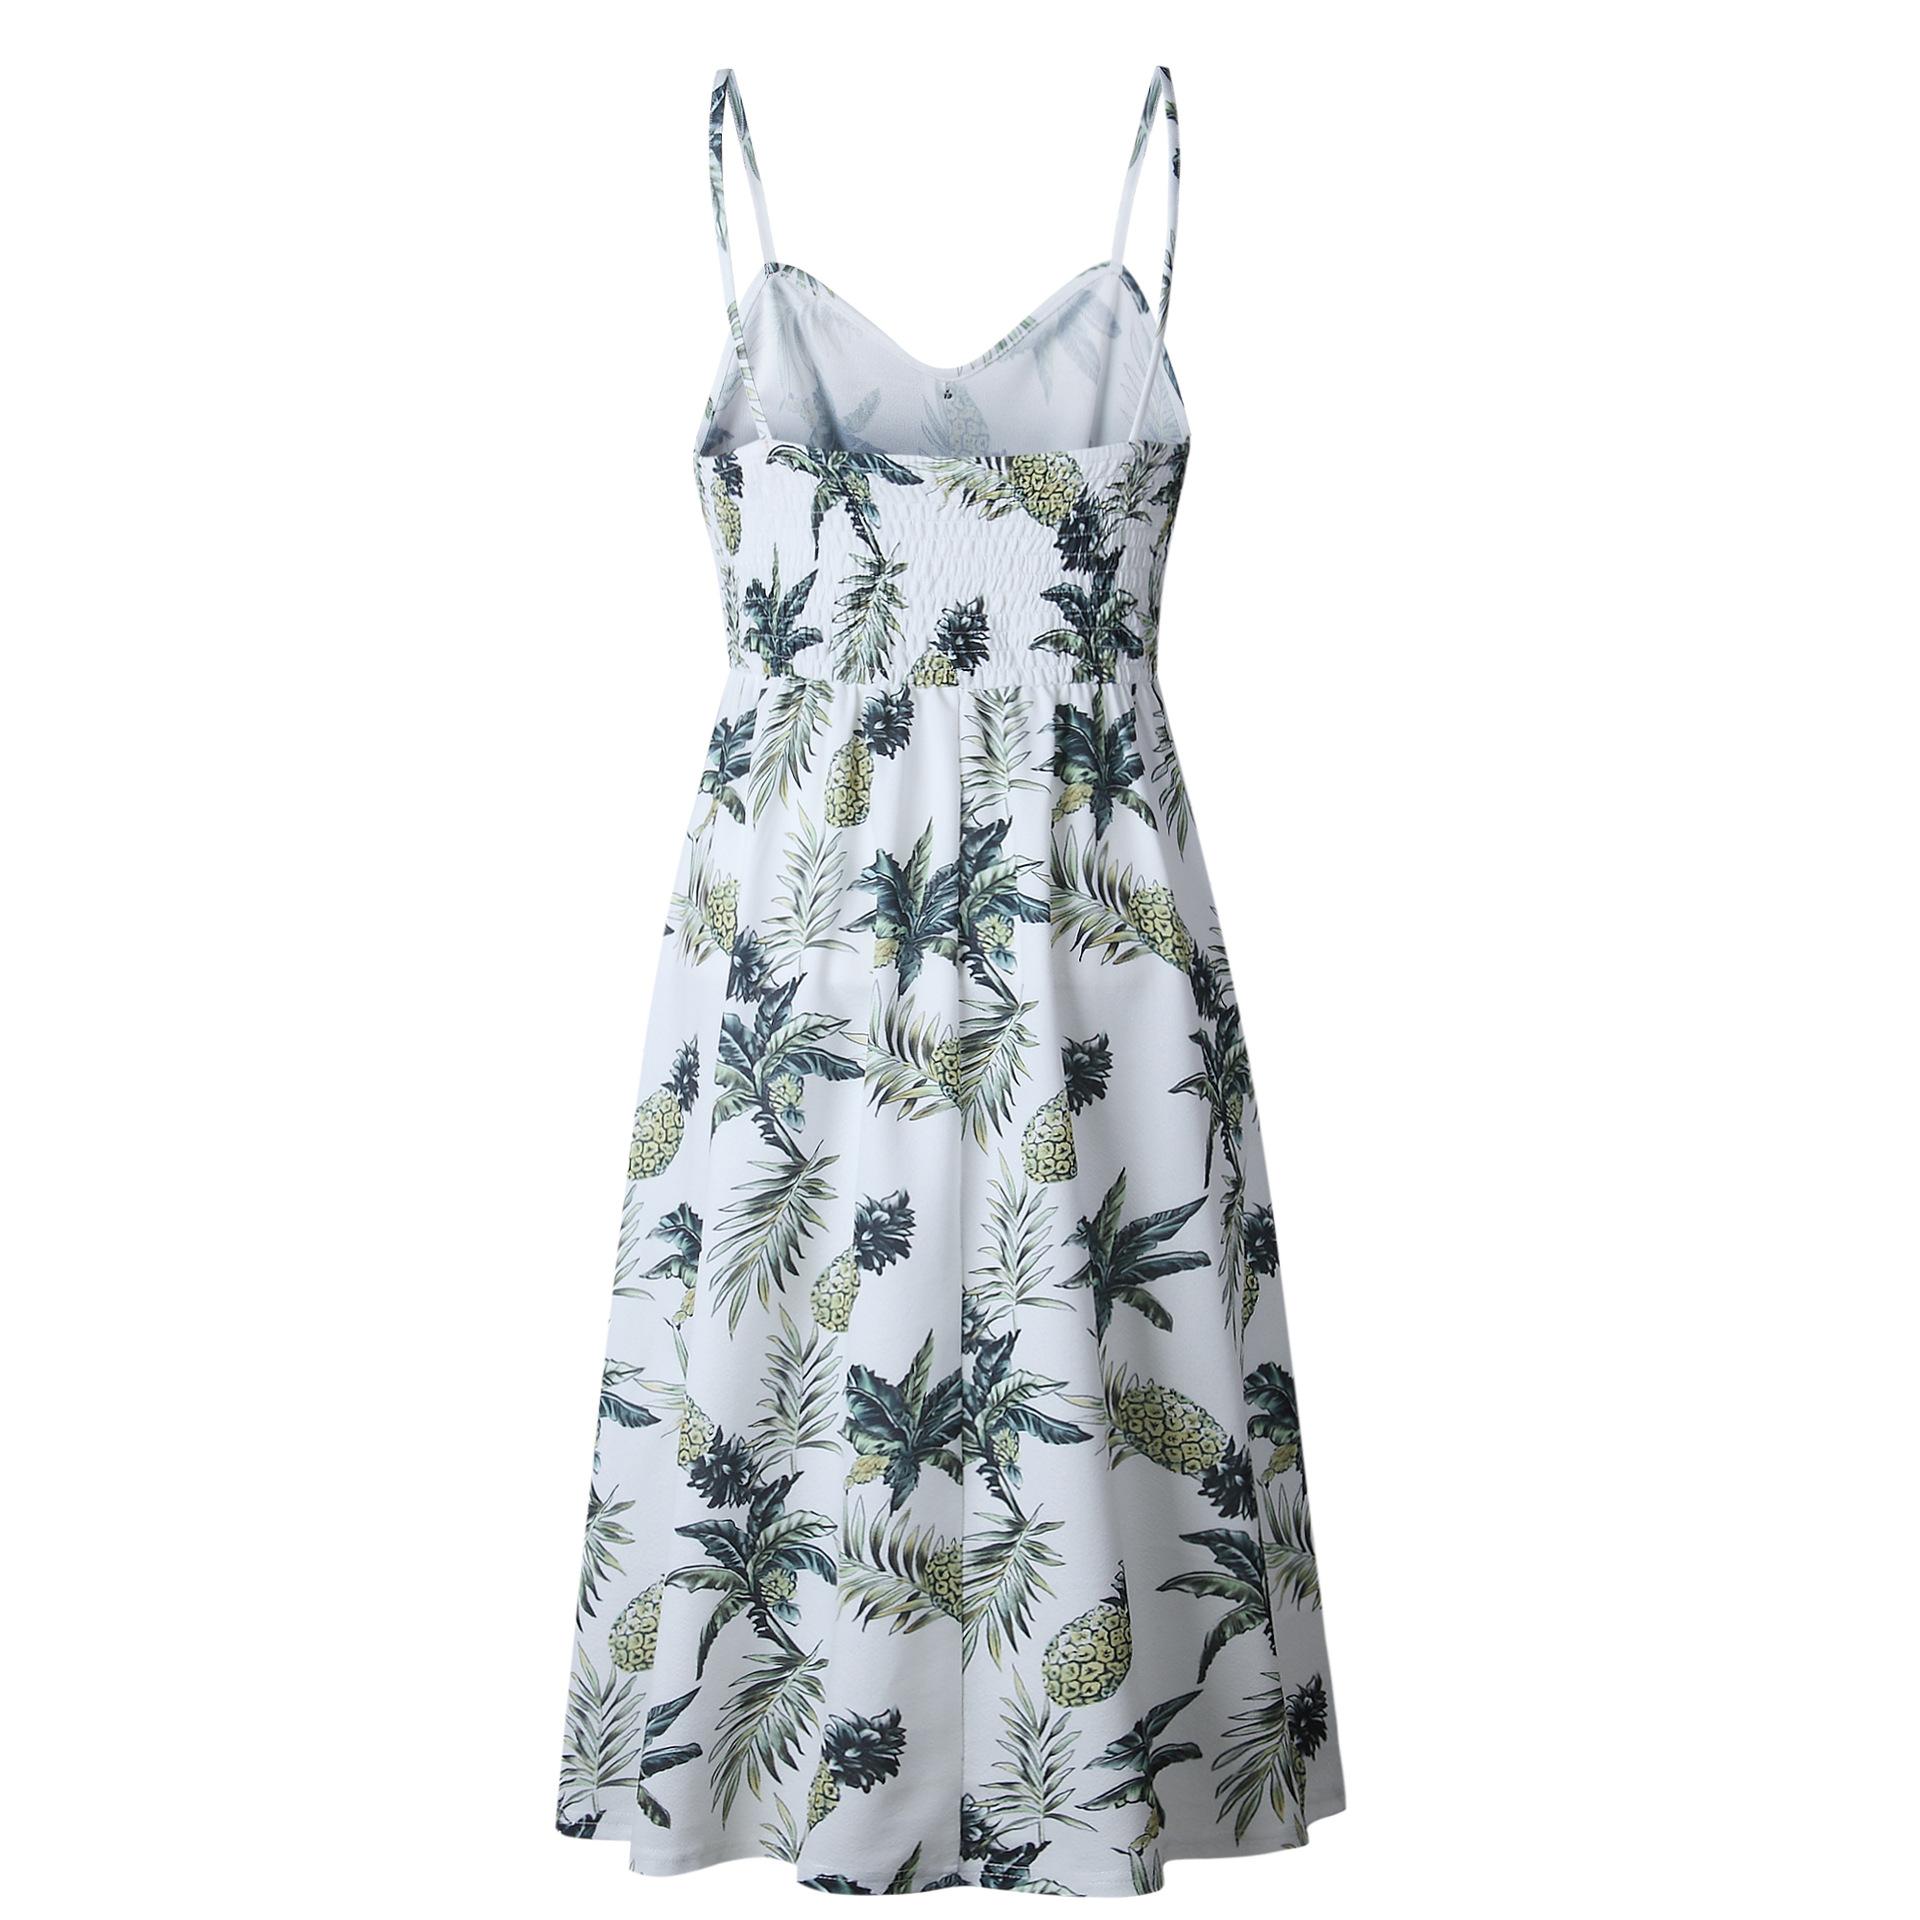 Boho Spaghetti Long Party Beach Dress